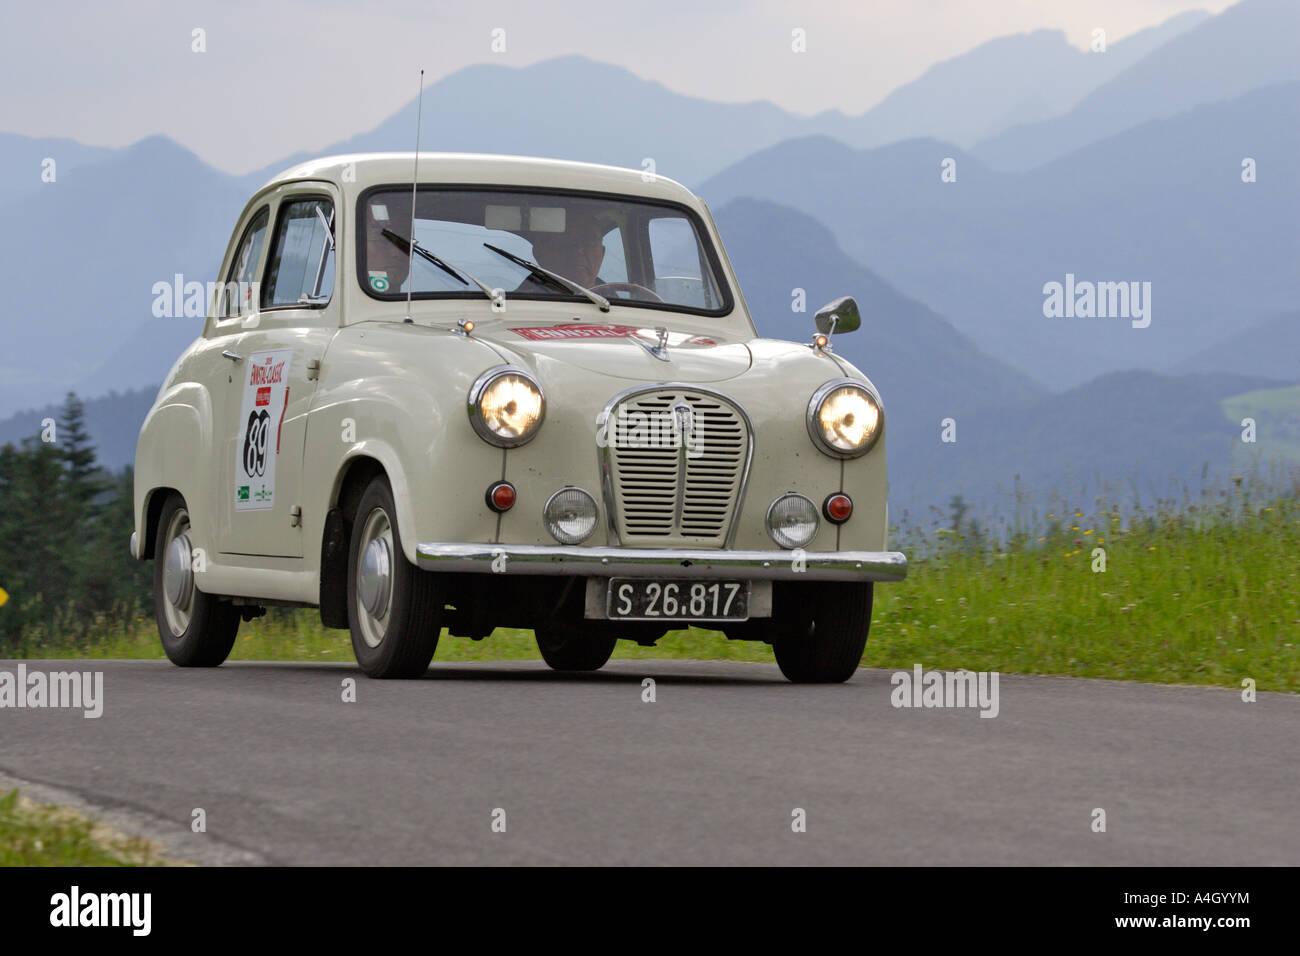 Triumph TR 3 built 1956, oldtimer race Ennstal Classic 2005, Styria, Austria - Stock Image